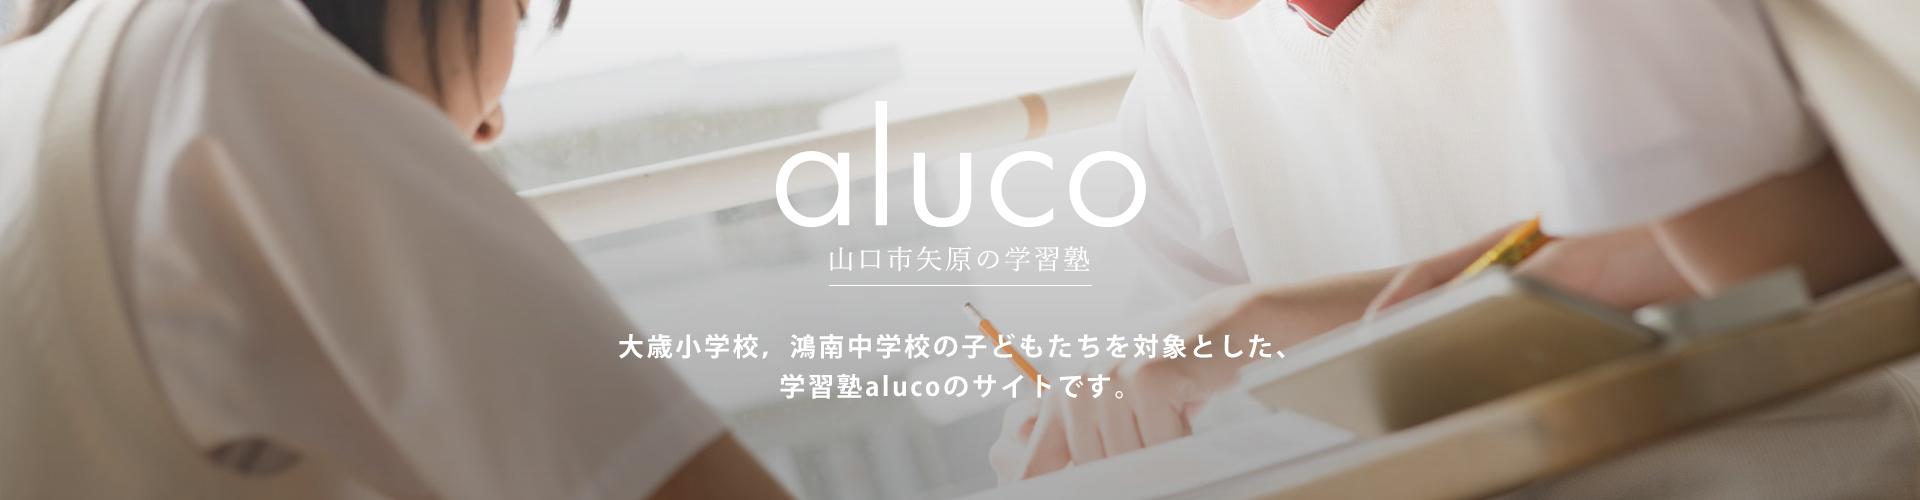 alico 山口市矢原の学習塾 大歳小学校、鴻南中学校の子どもたちを対象とした、学習塾alucoのサイトです。